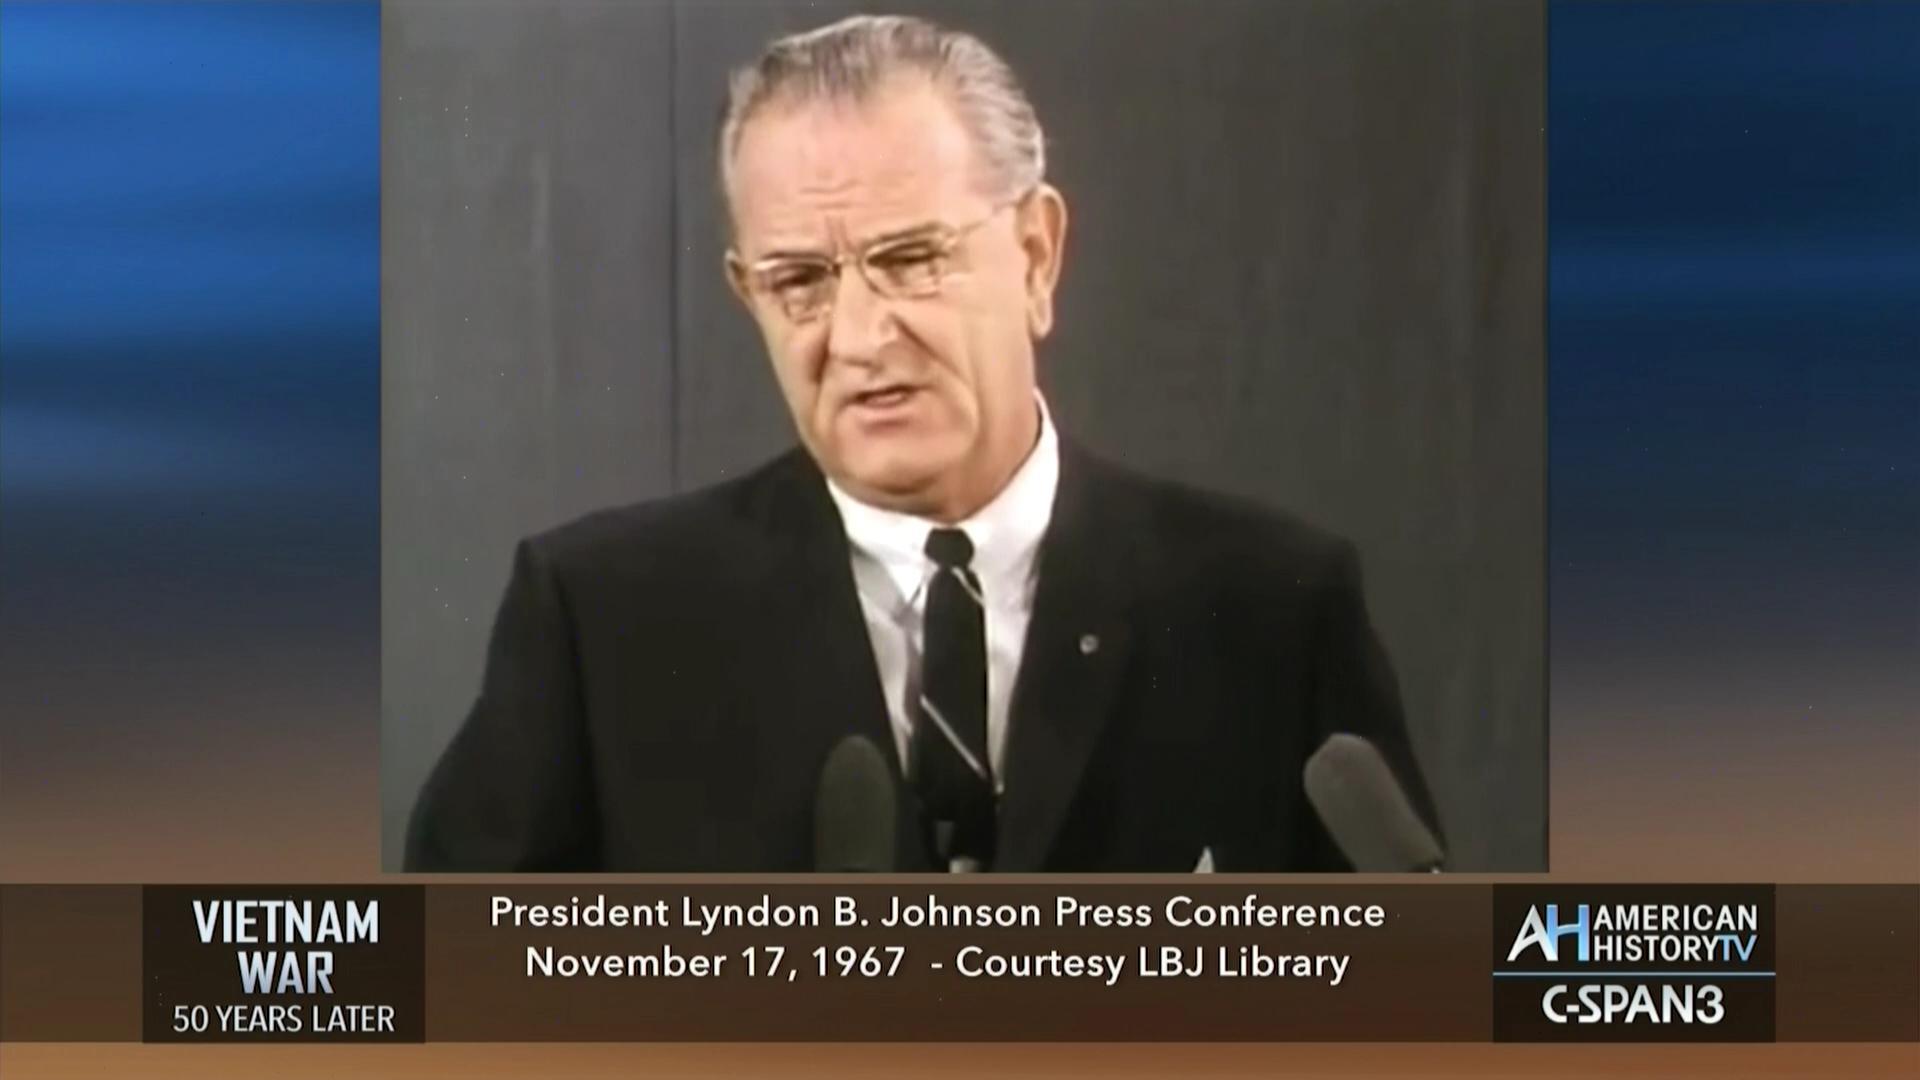 President Johnson on the Vietnam War